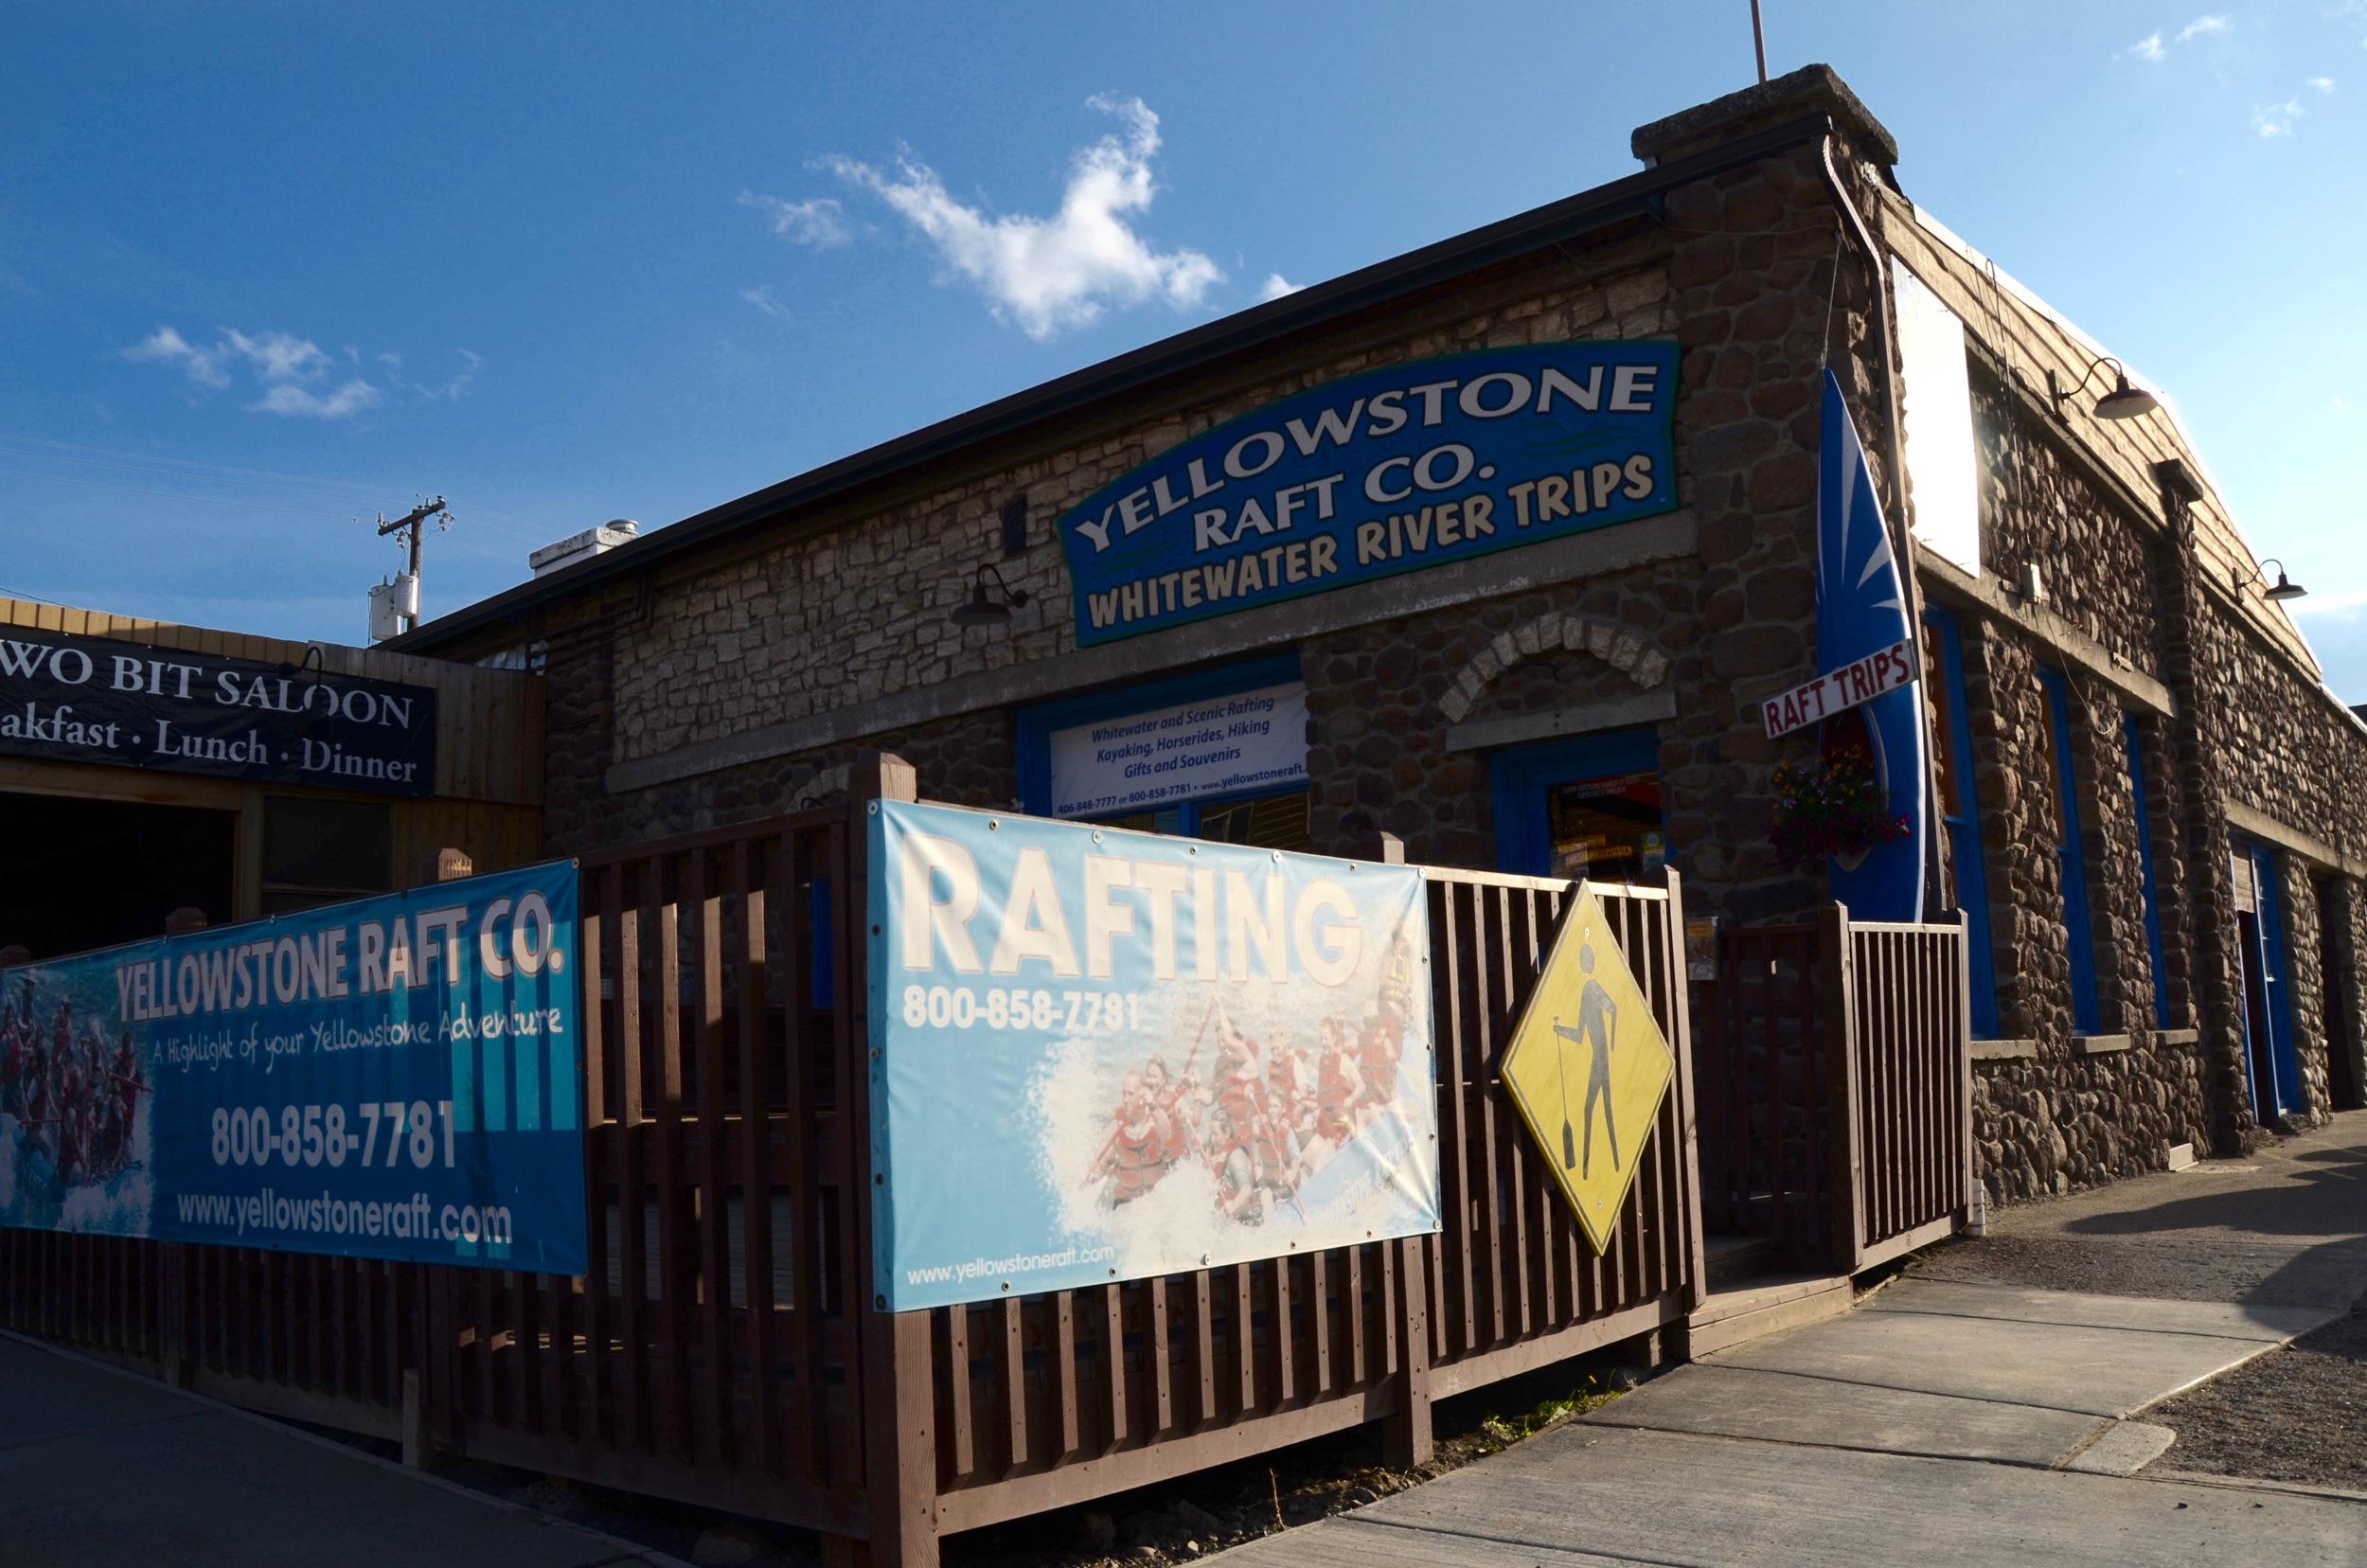 Yellowstone Raft Company